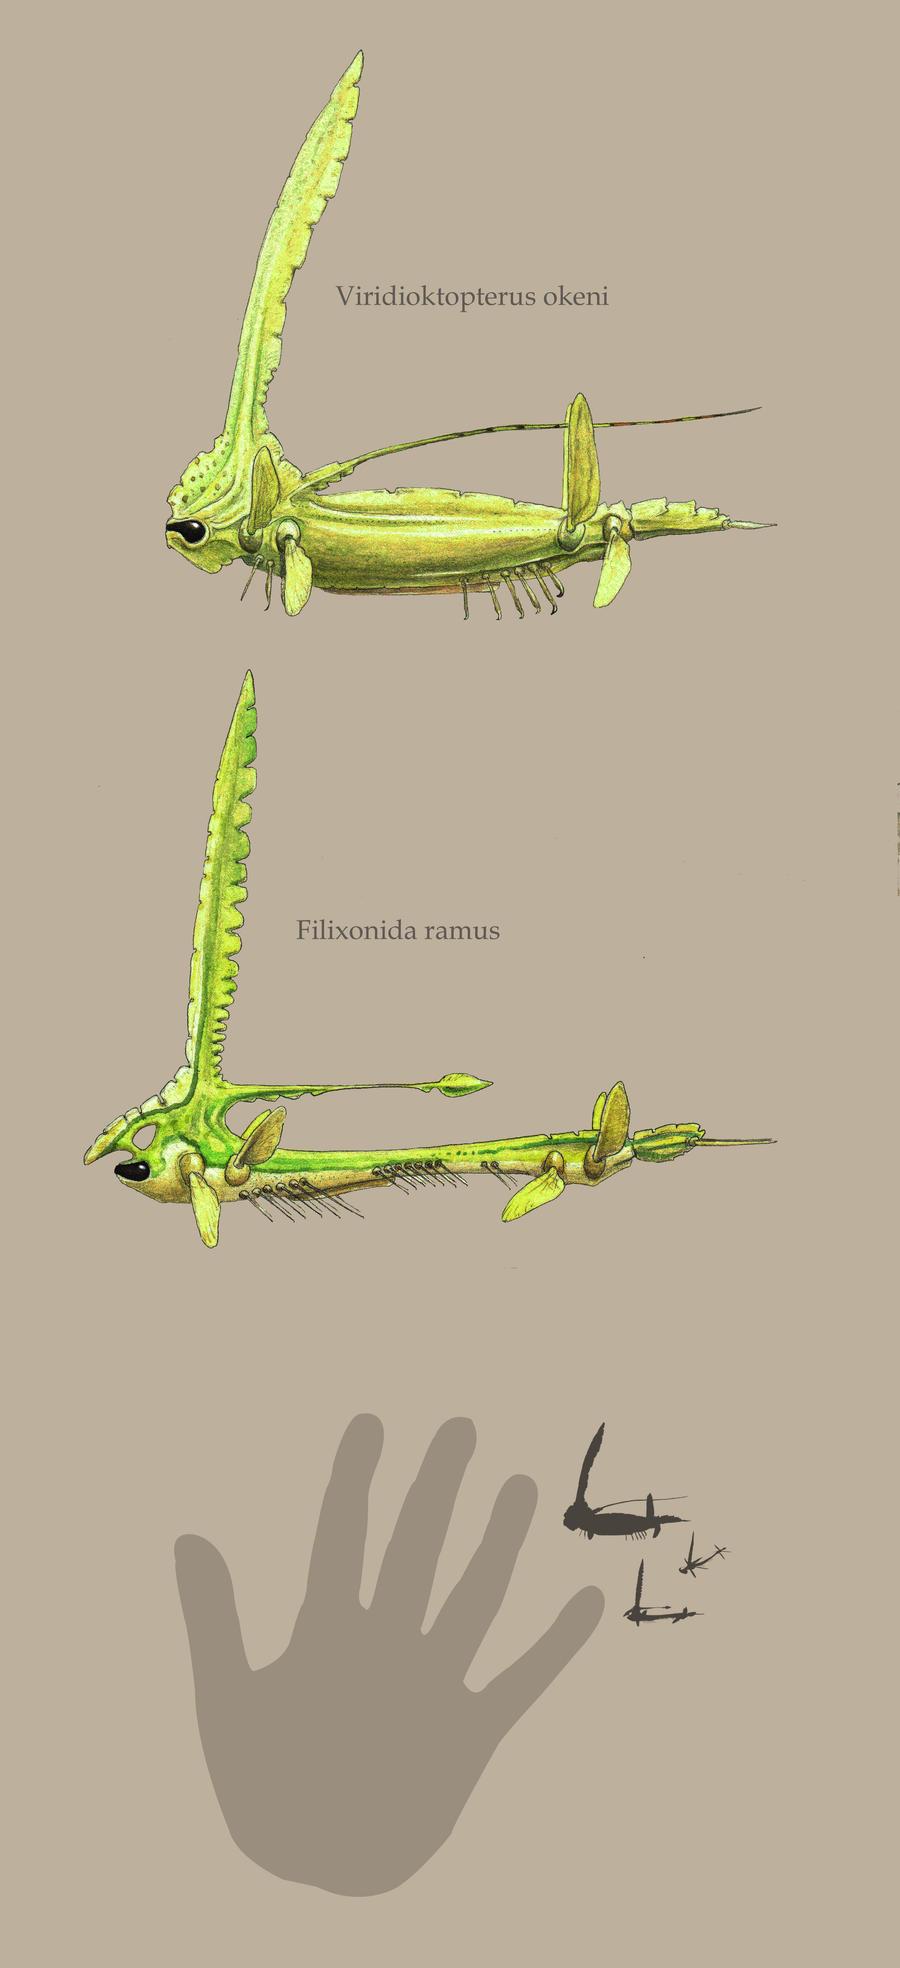 Viridioctopterus and Filixonida by Hyrotrioskjan